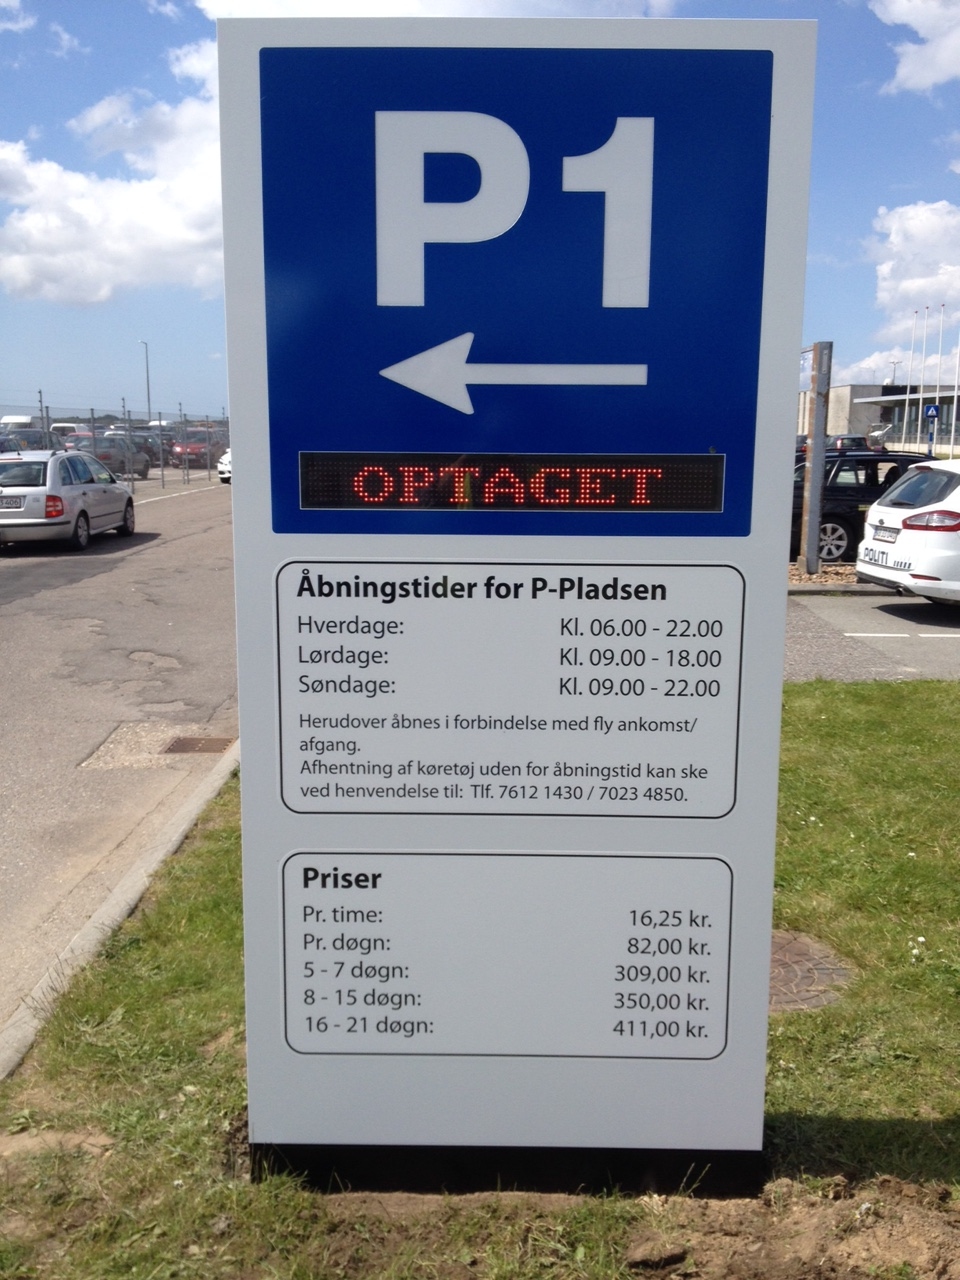 Pylon - Parkeringsstander med indbygget lysavis - Esbjerg Lufthavn